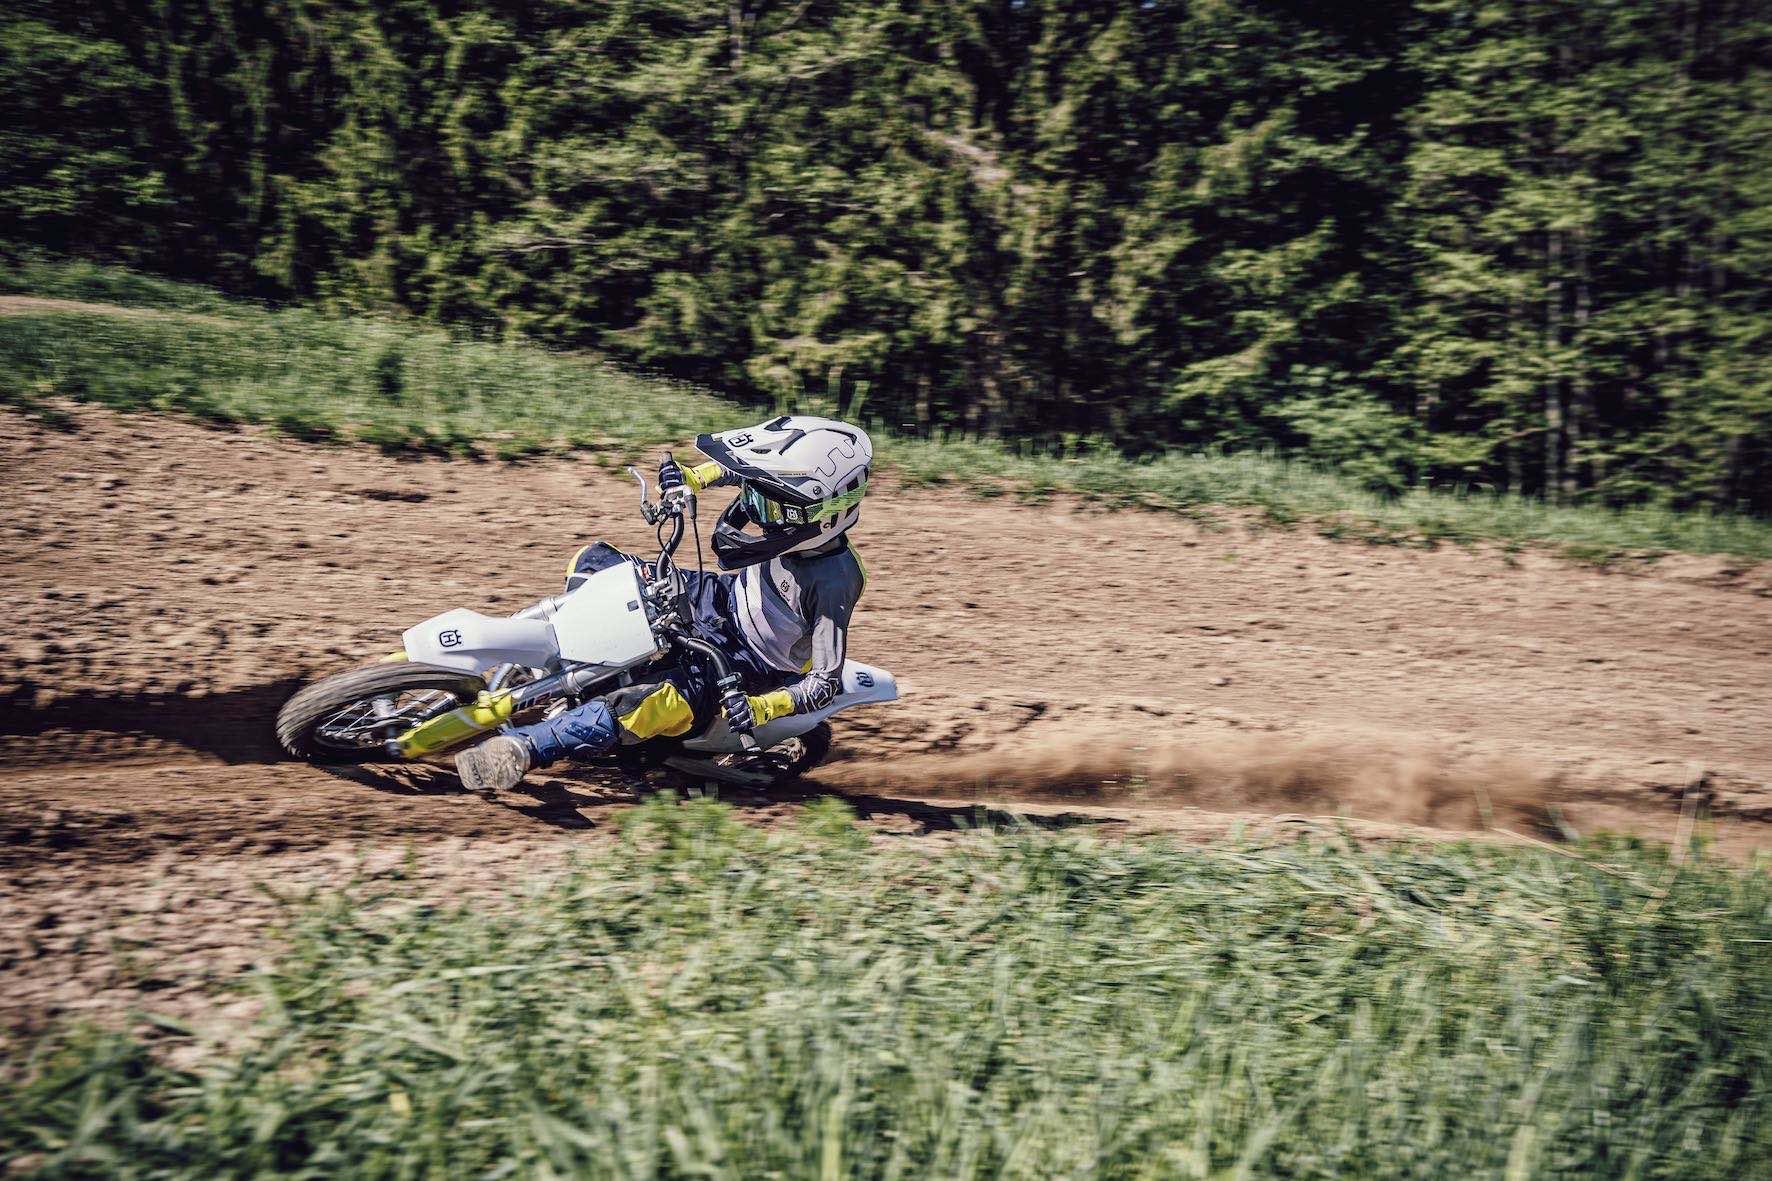 Introducing the 2021 Husqvarna Minicycles Motocross Range